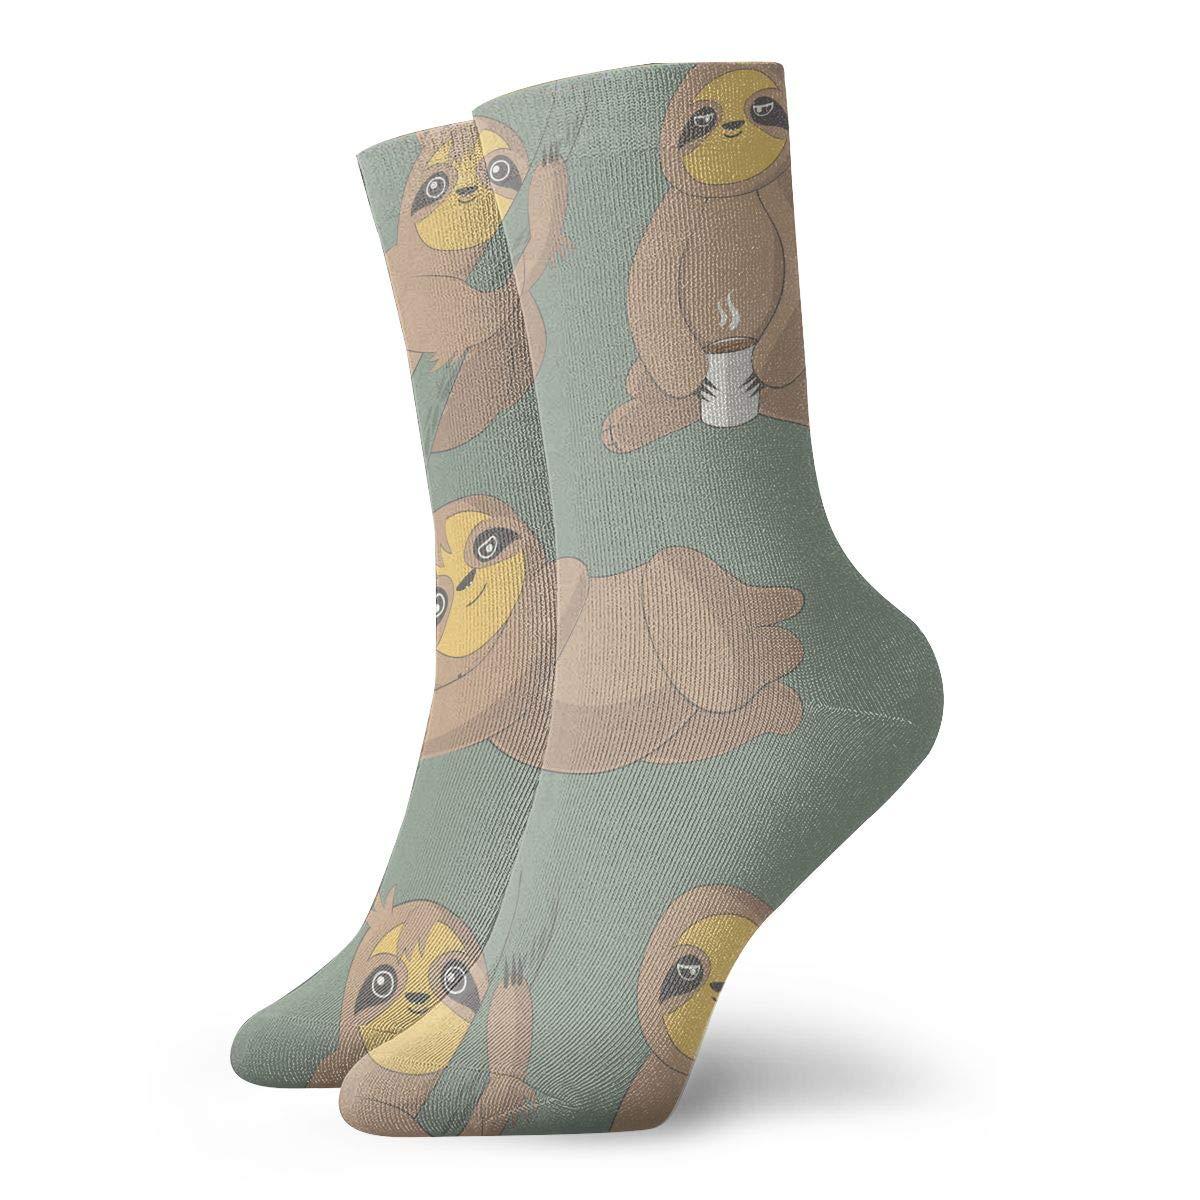 Baseball Athletic Best for Ski TAOMAP89 Three Nice Sloths Pattern Compression Ankle Socks for Women and Men Slipper Warm Socks